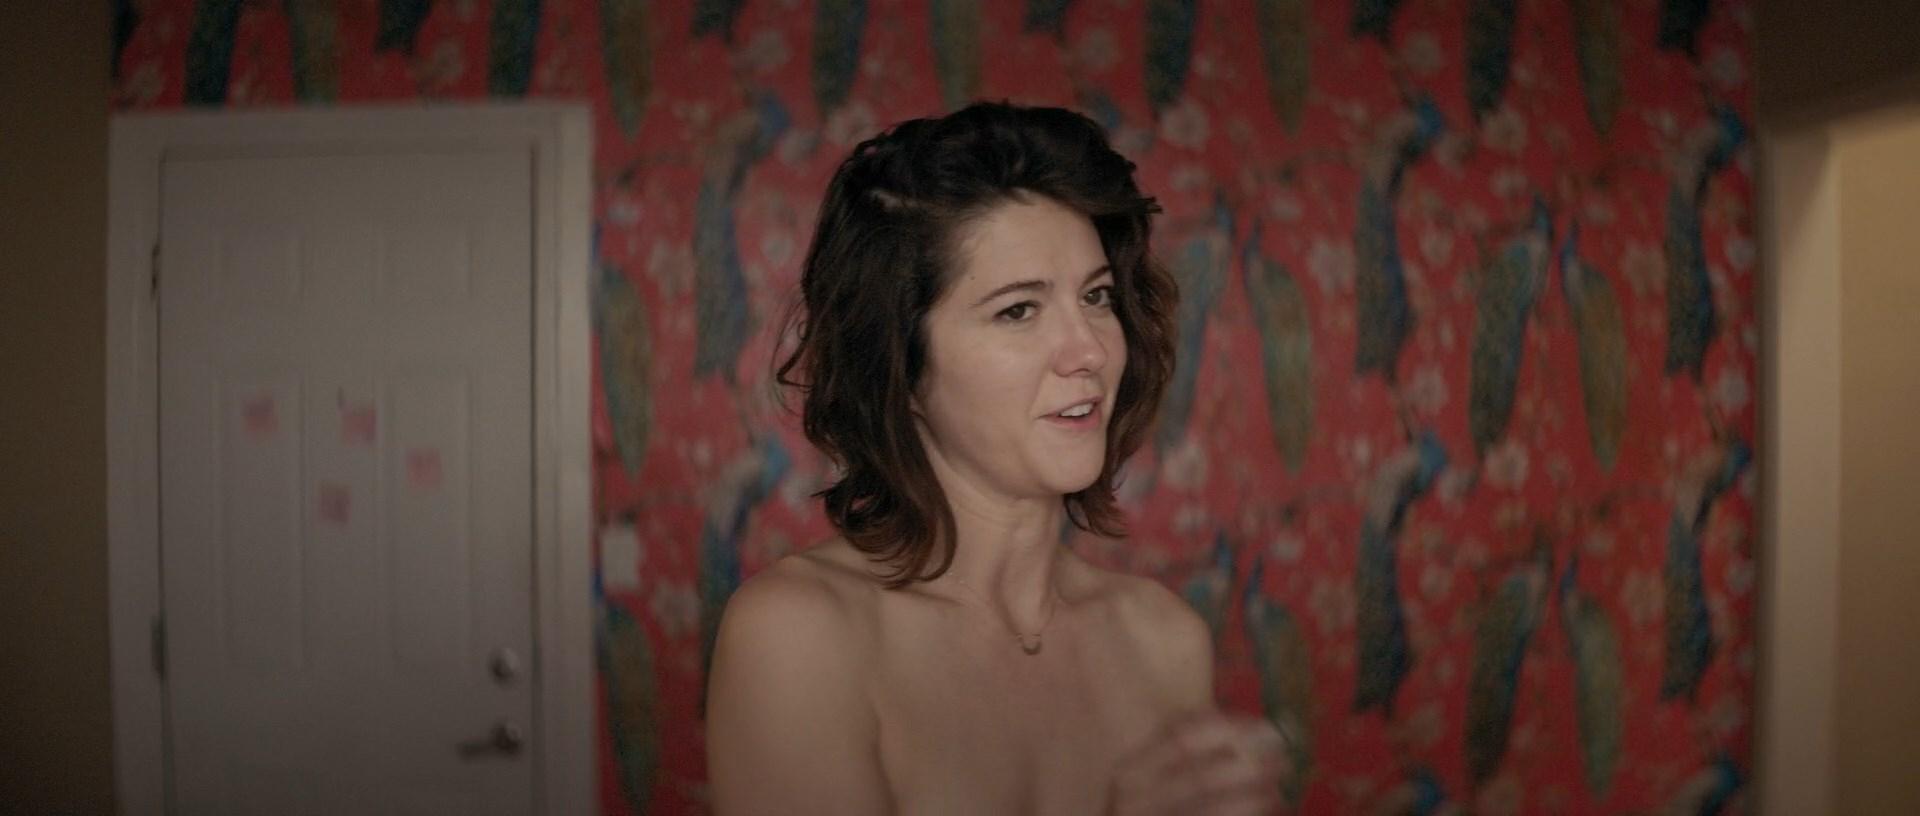 Mary elizabeth winstead nude scene on scandalplanet com